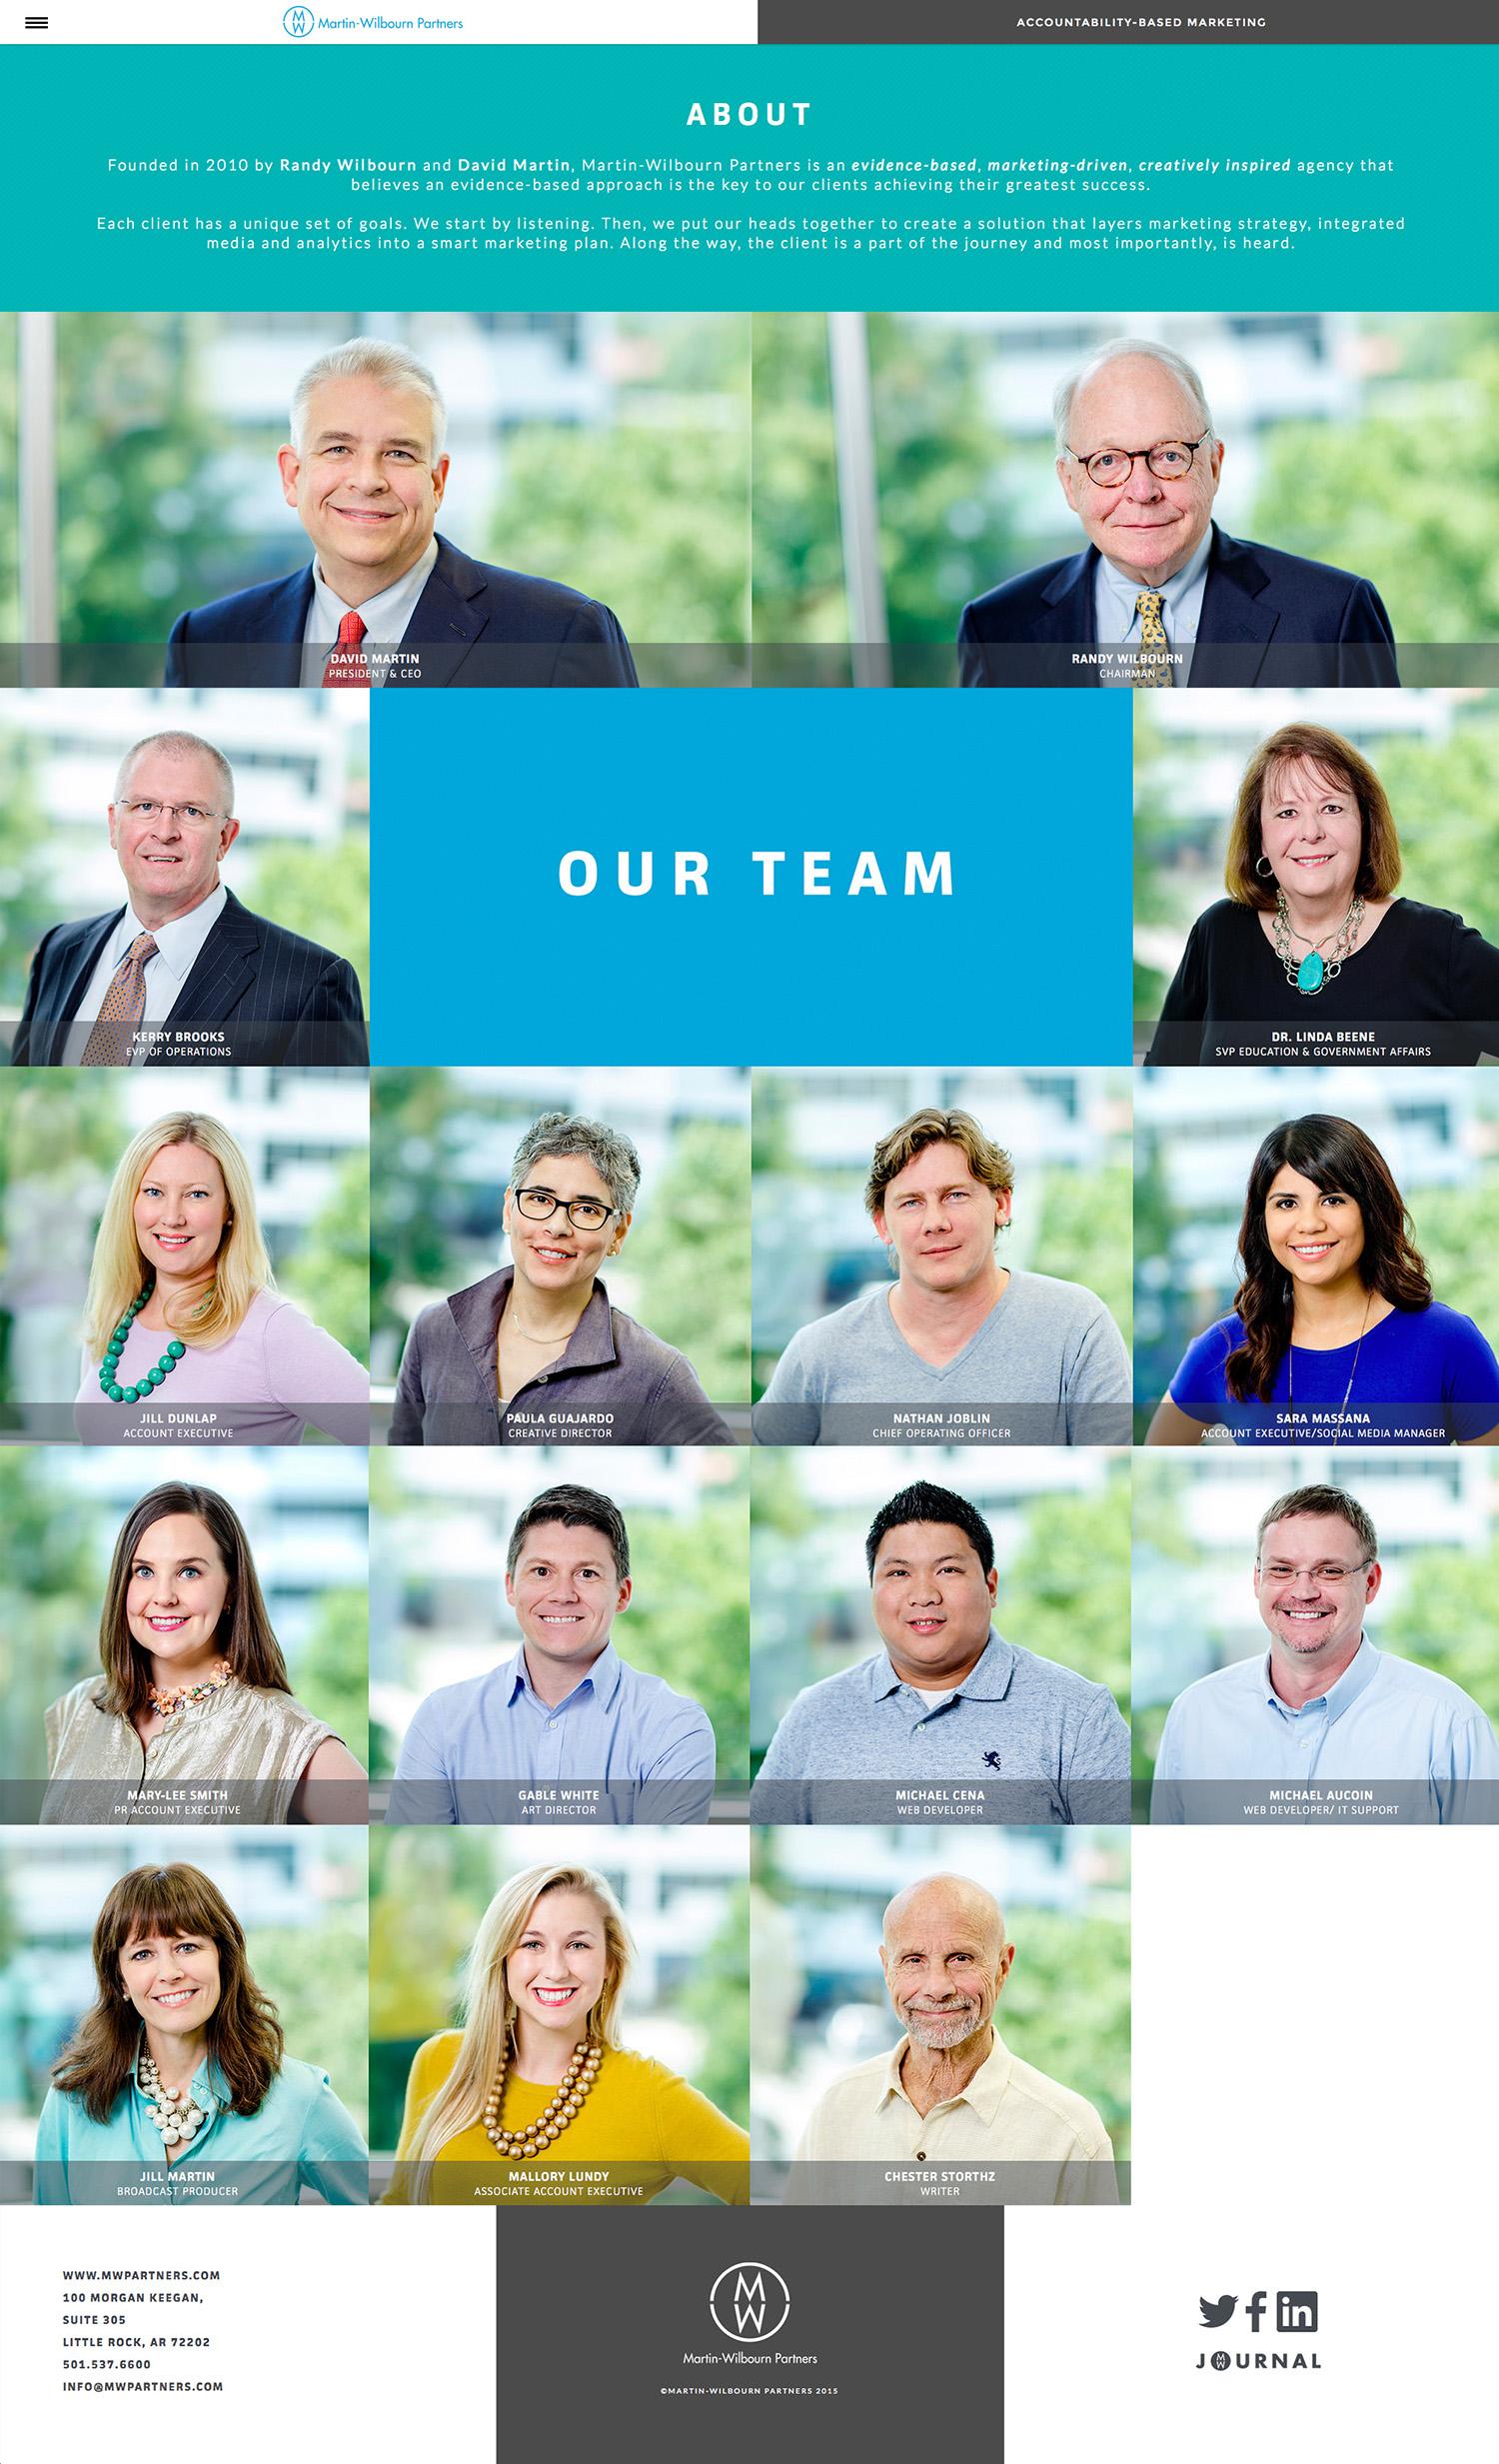 Meet the creative team at Martin-Wilbourn Partners.